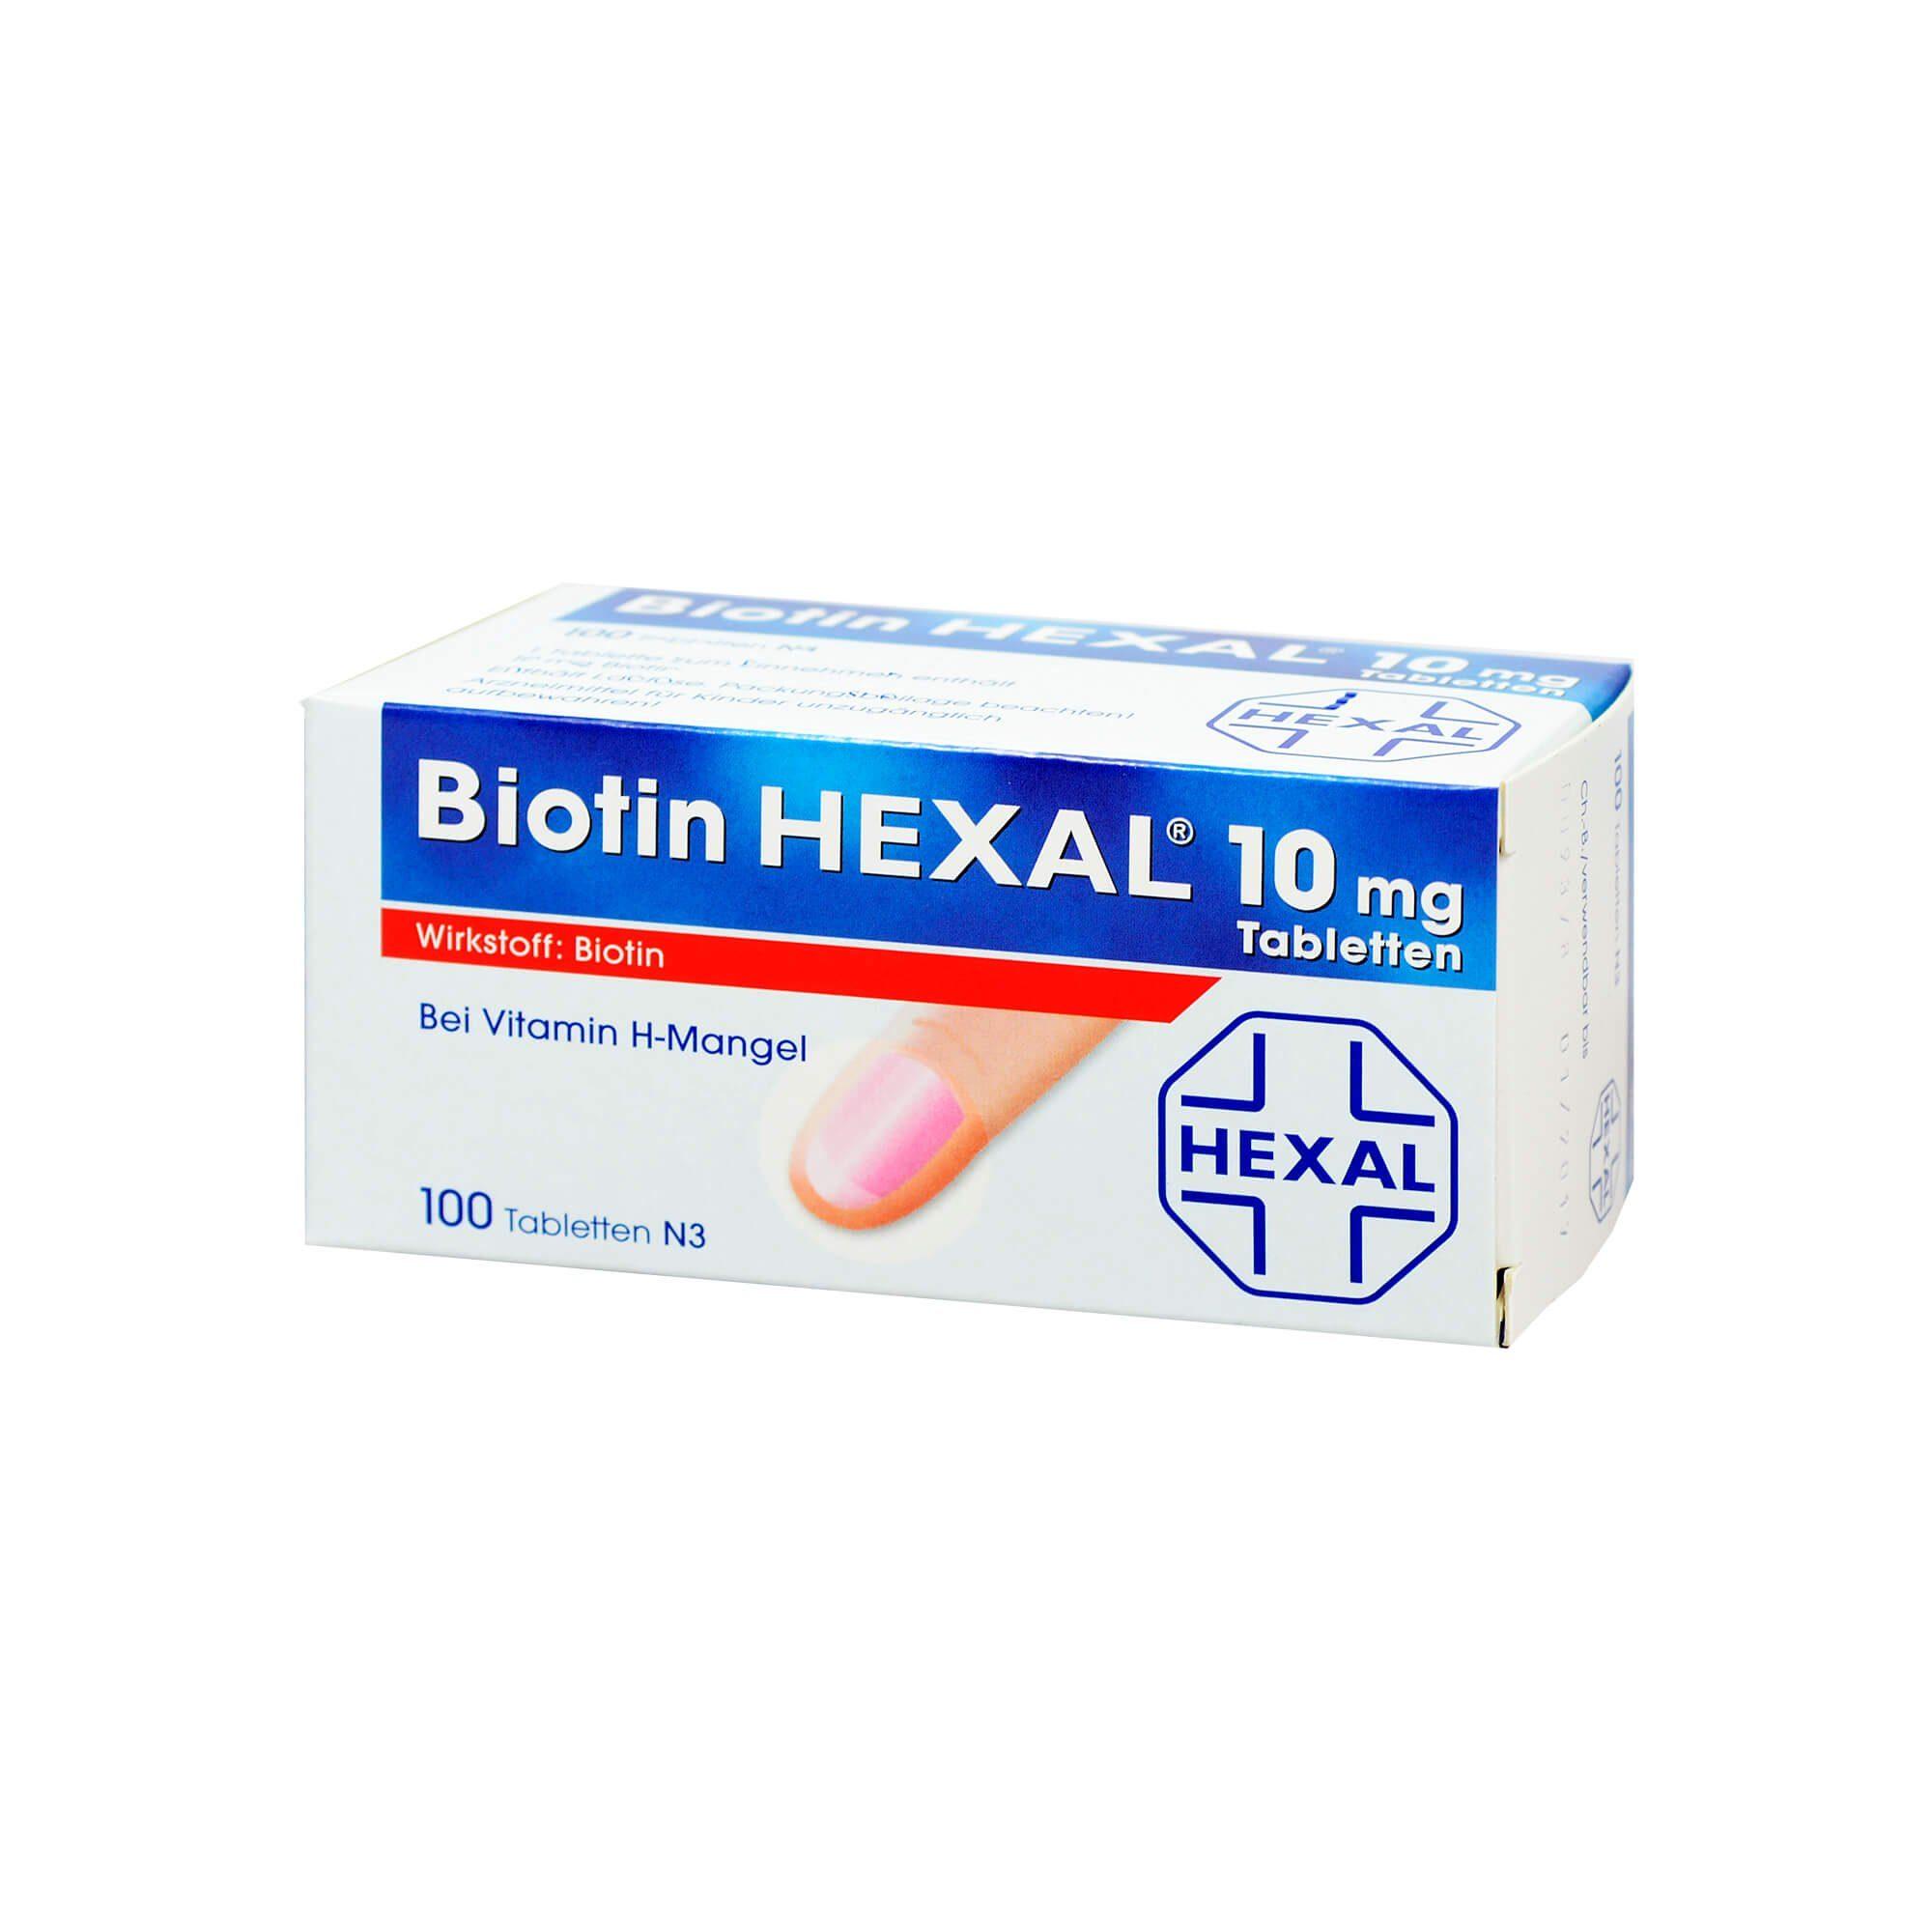 Biotin Hexal 10 mg, 100 St